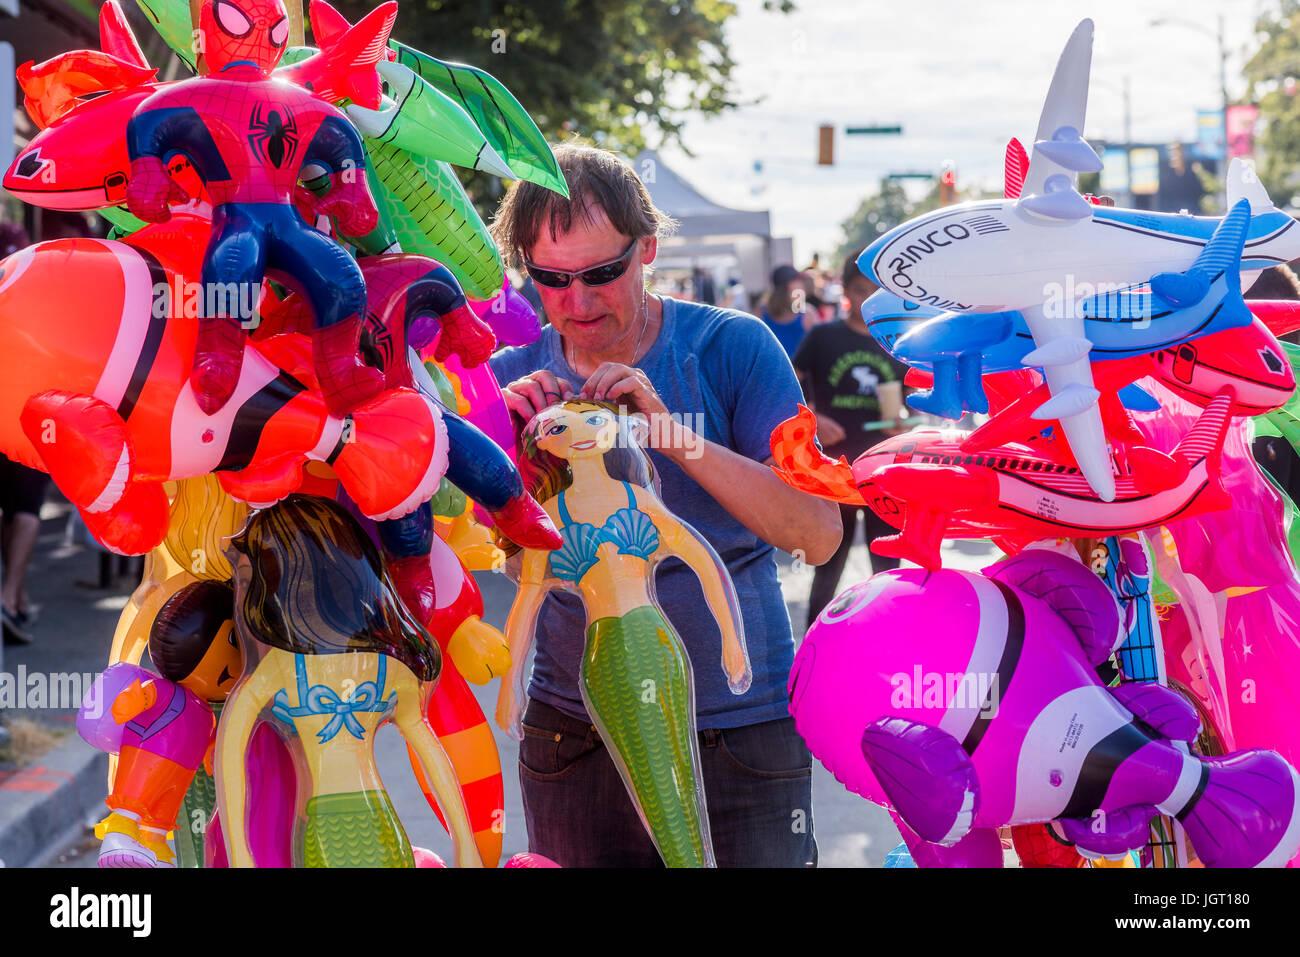 Inflatable toy vendor, Khatsalano Festival, Kitsilano, Vancouver, British Columbia, Canada. Stock Photo